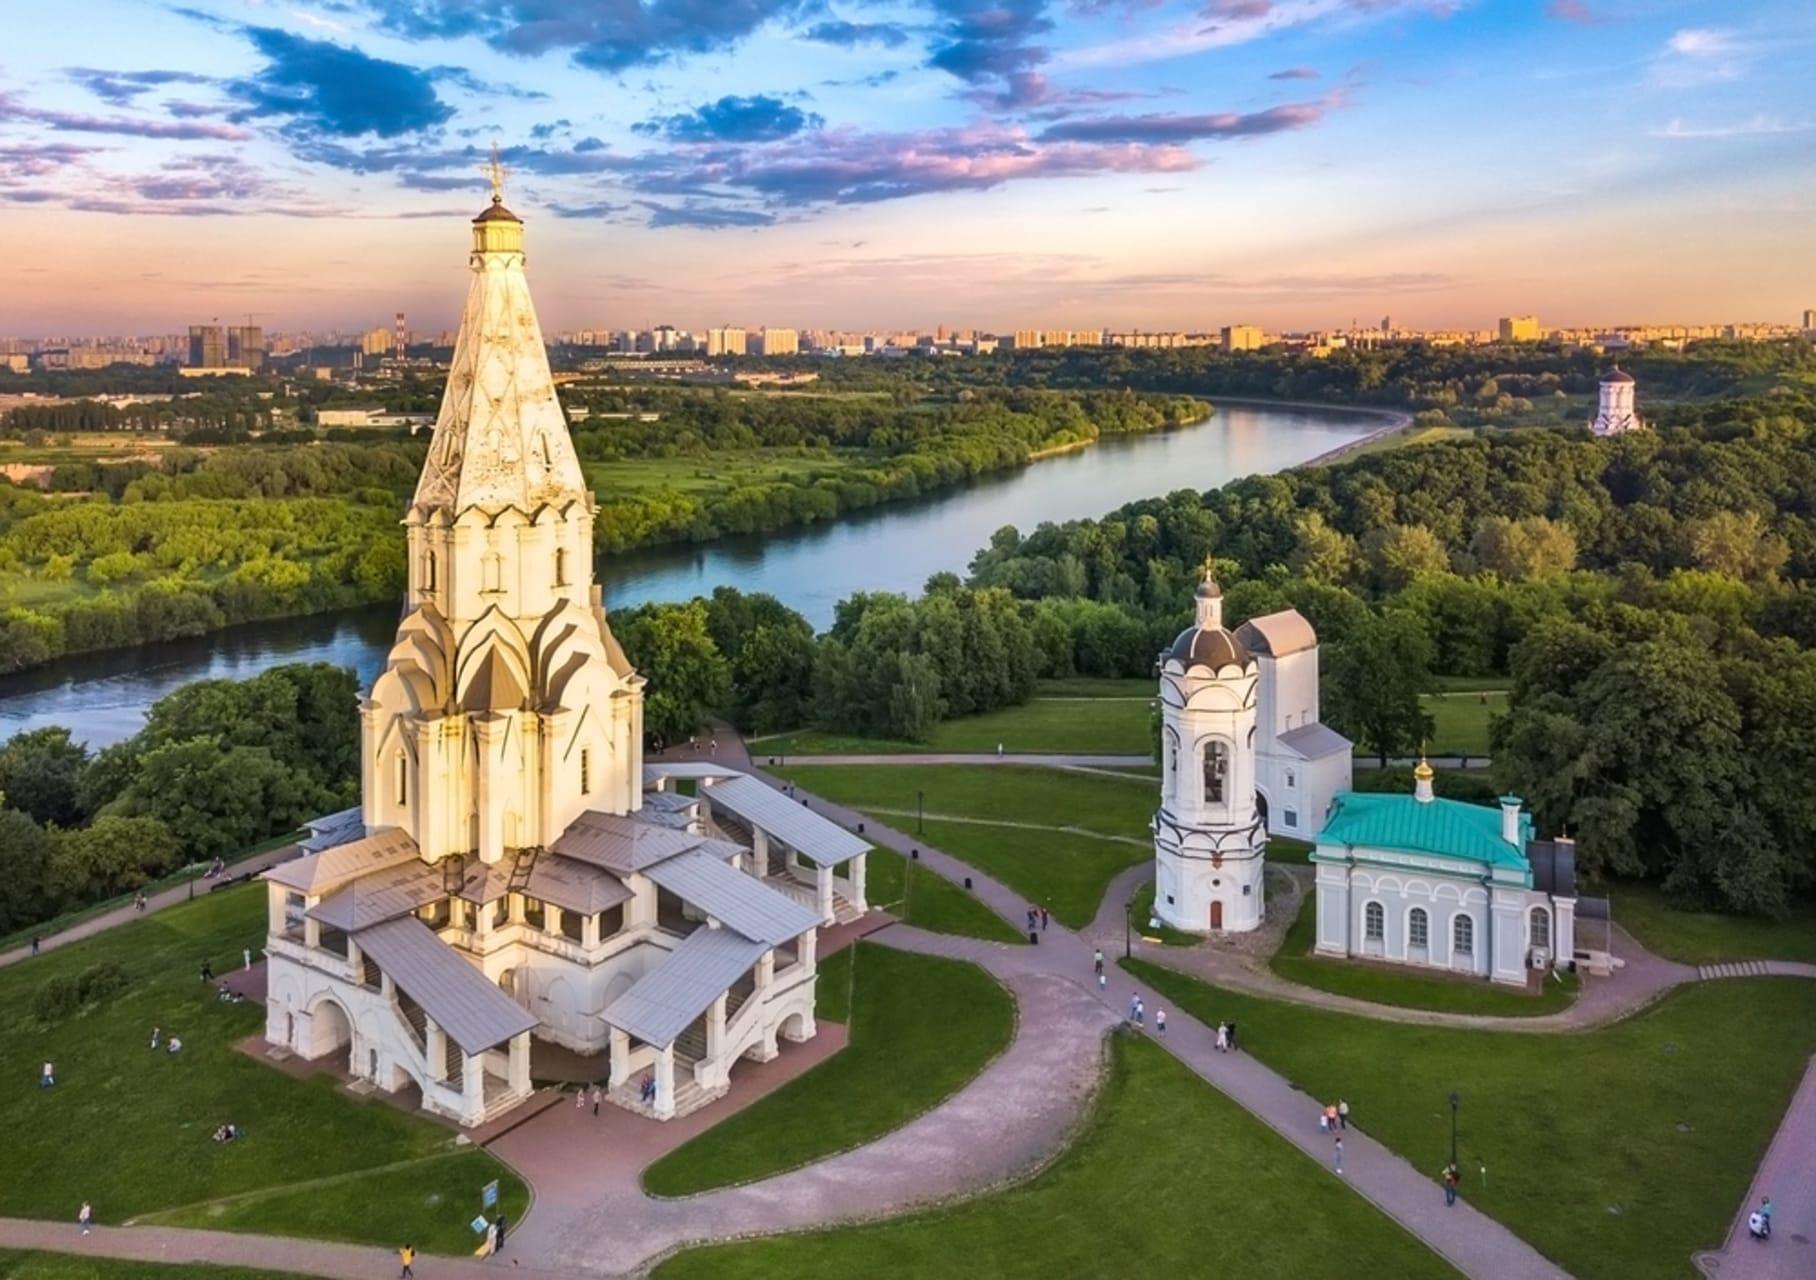 Moscow - Kolomenskoye Park: UNESCO Heritage in Moscow